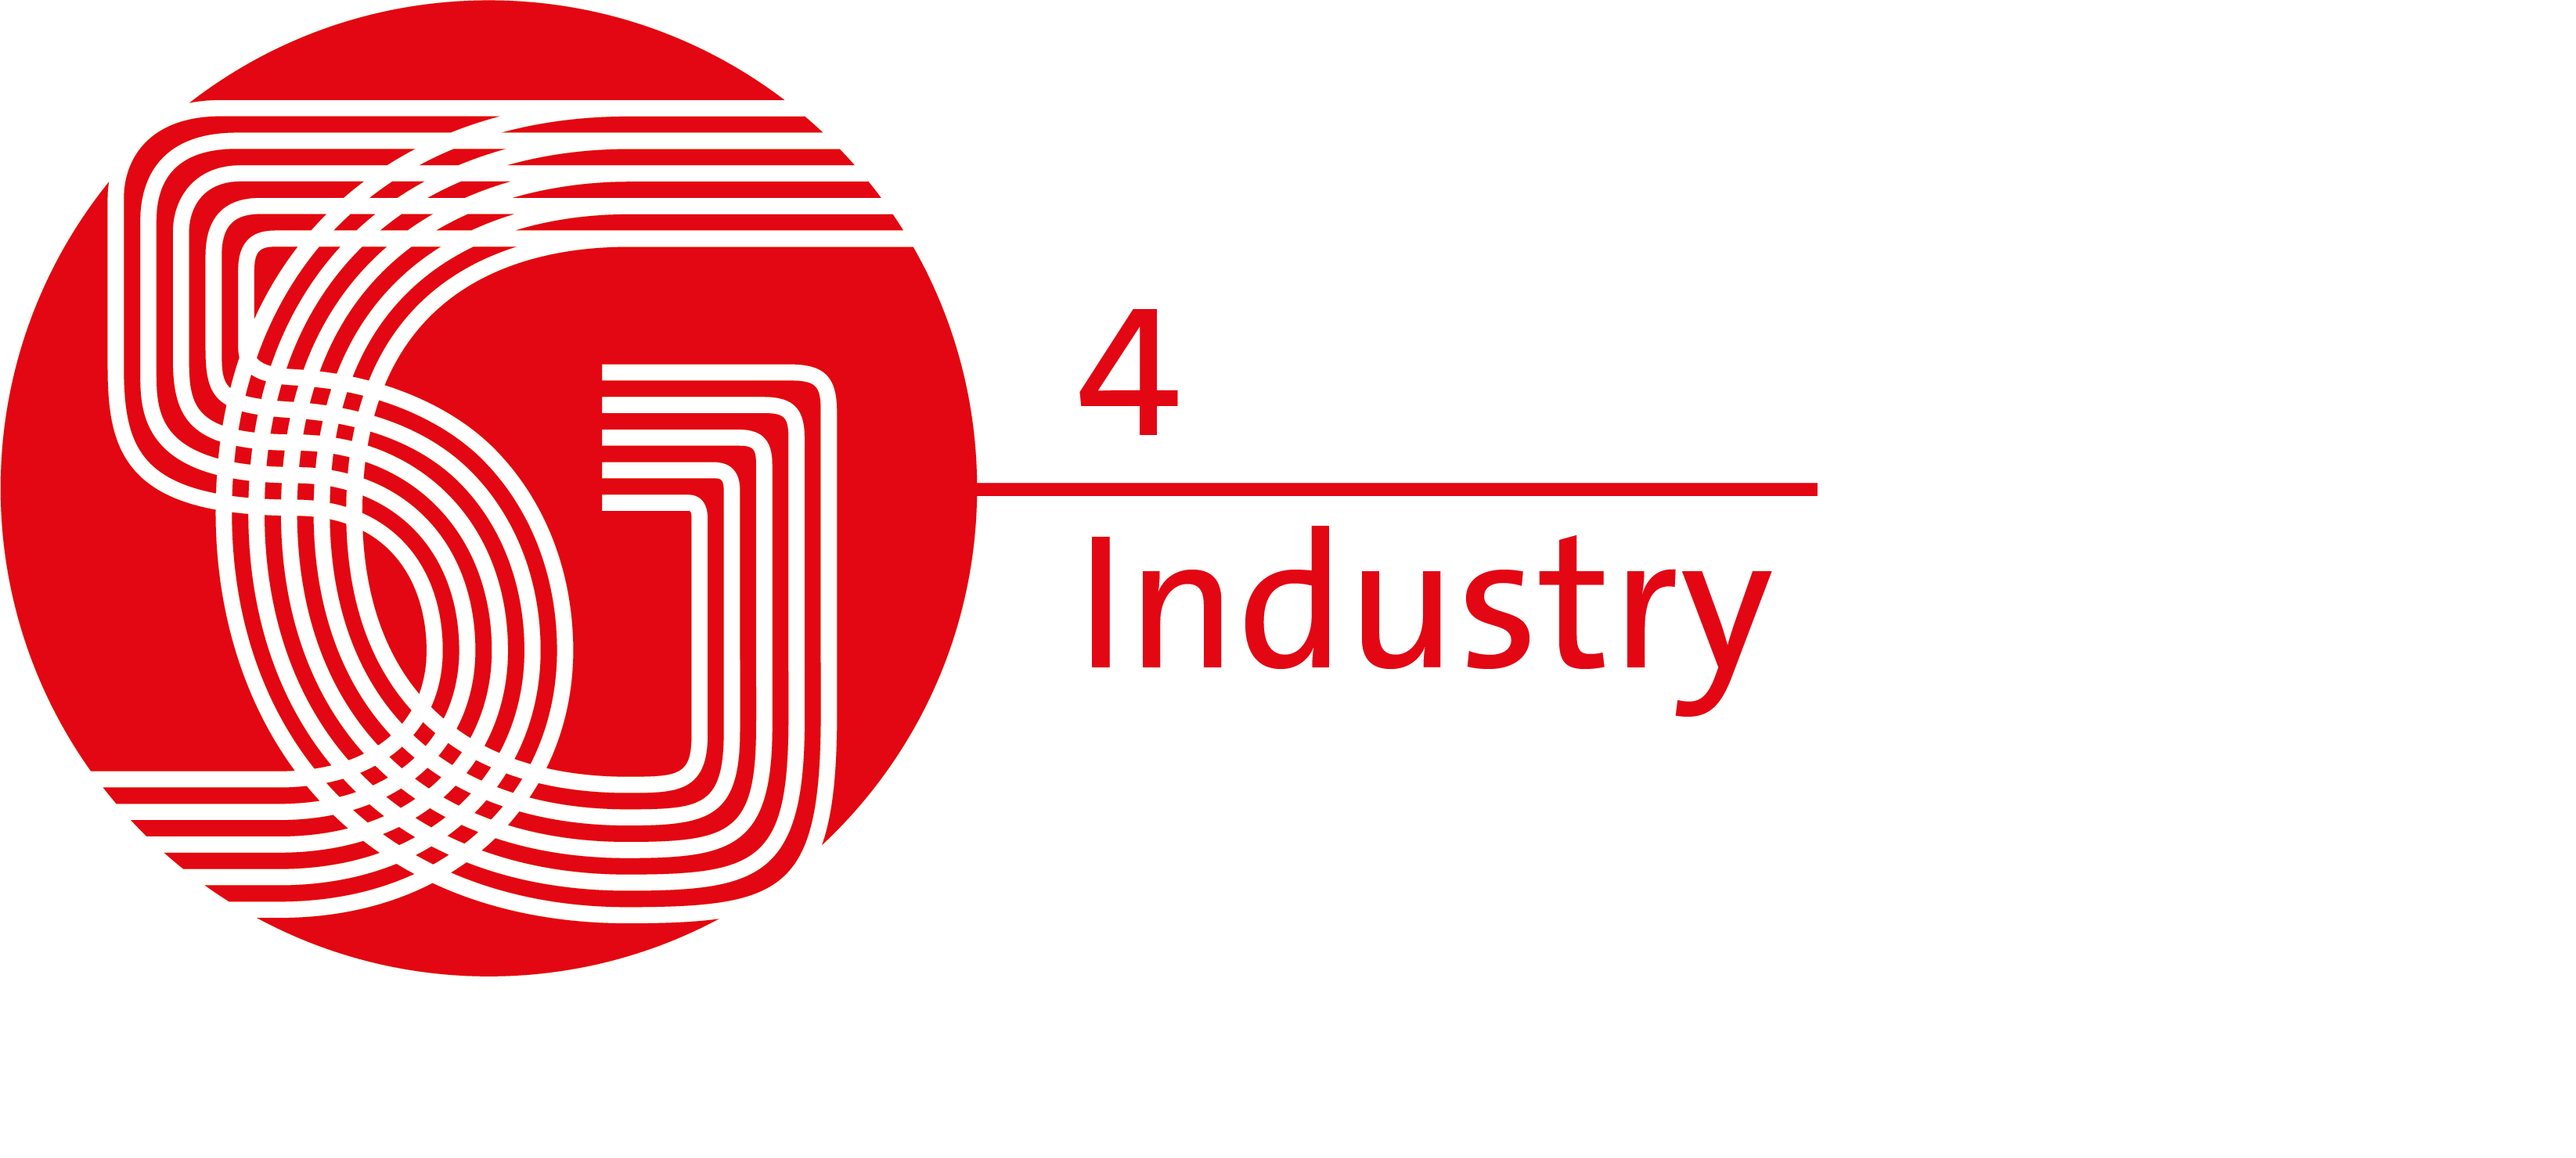 5G4Industry